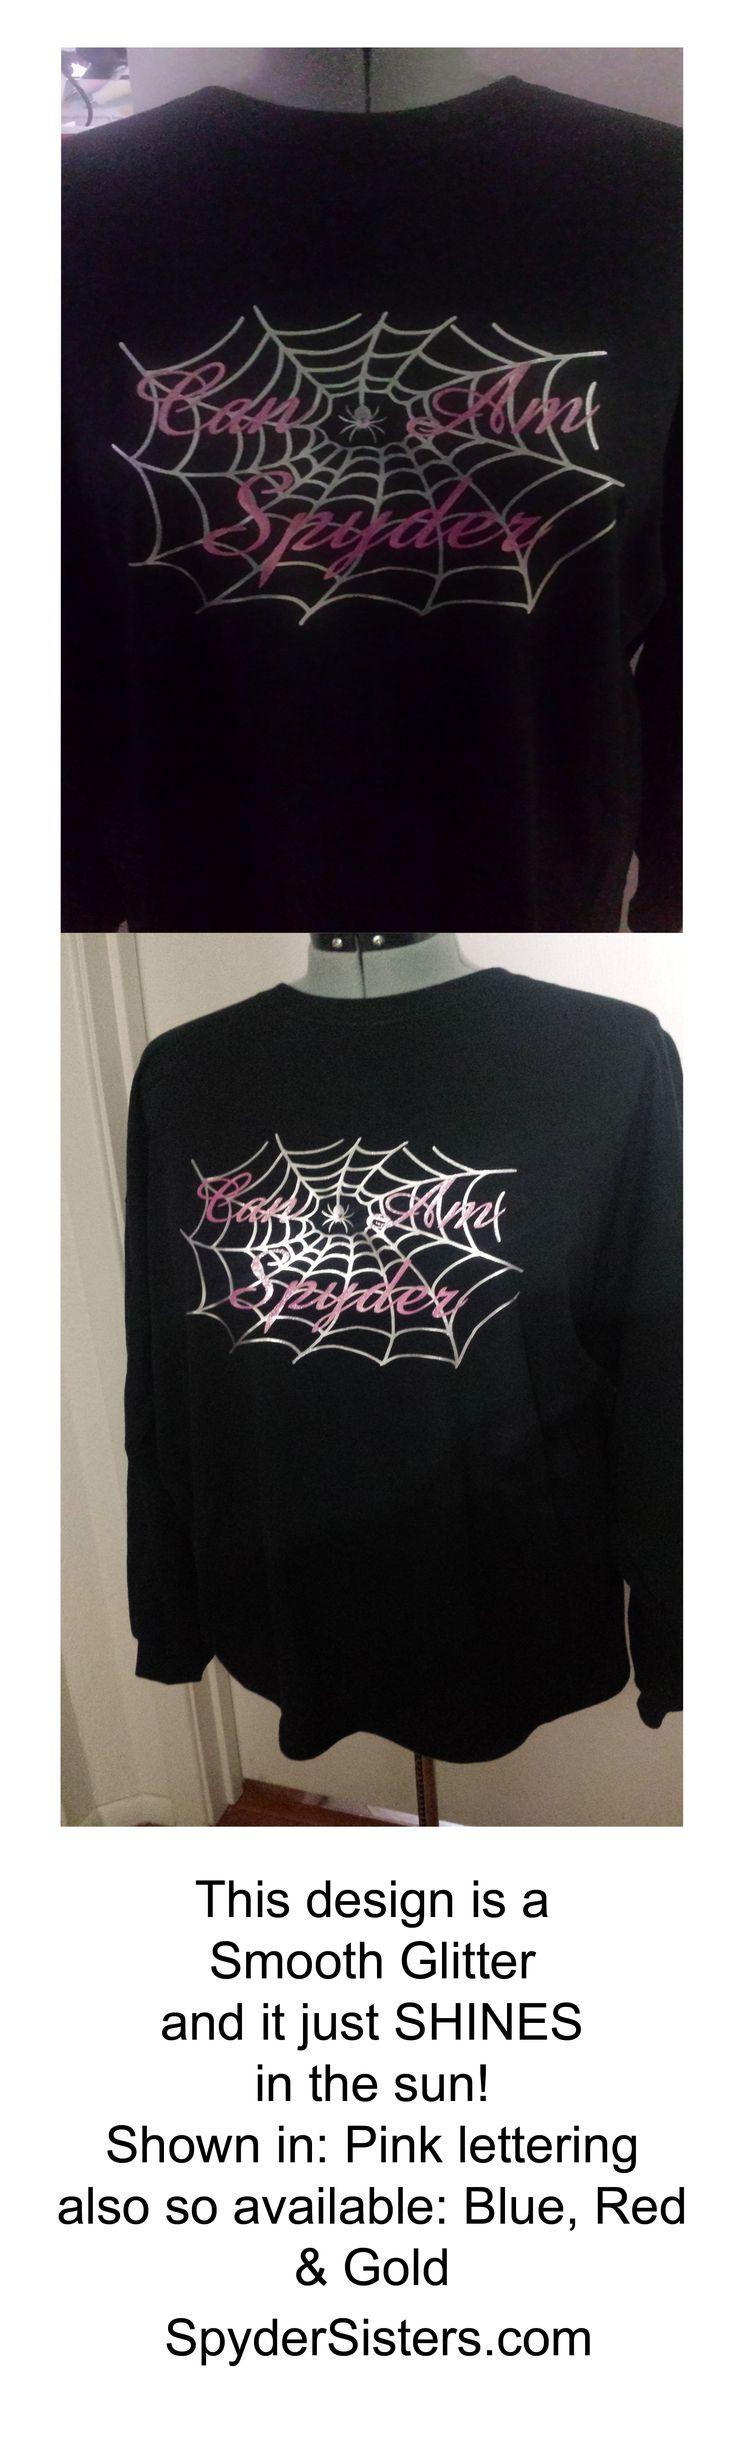 Can am Spyder Shirt - Ladies